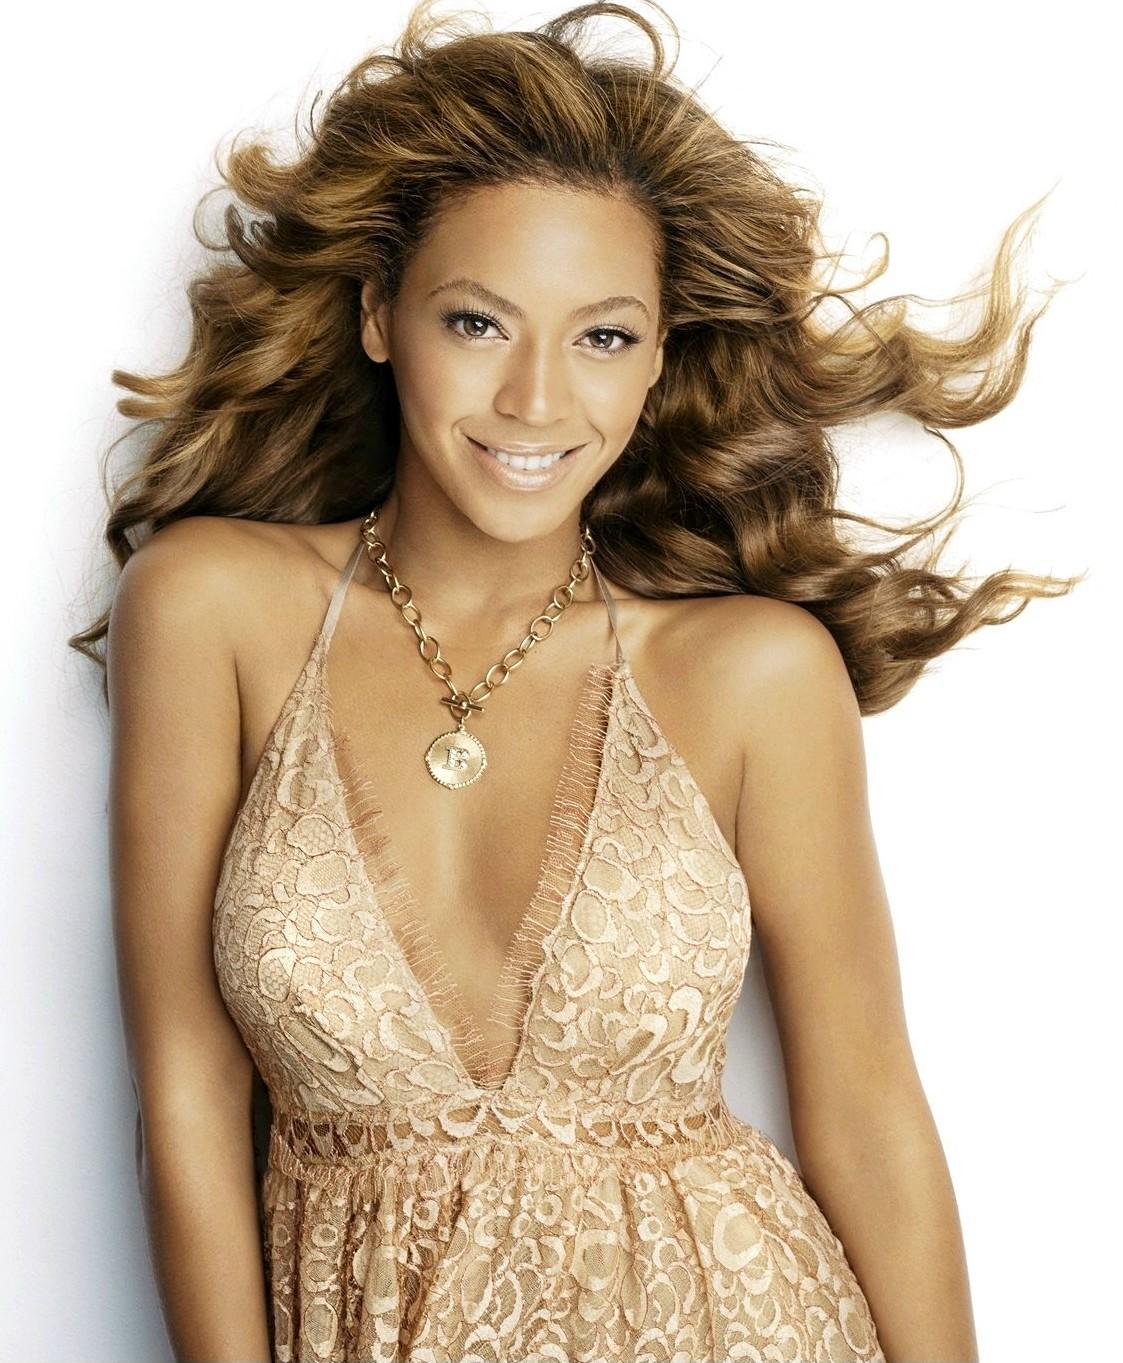 http://4.bp.blogspot.com/-ybCARrC28aU/UIgHNG-tnAI/AAAAAAAAIrY/Peer9hJcnh0/s1600/Beyonce.jpg